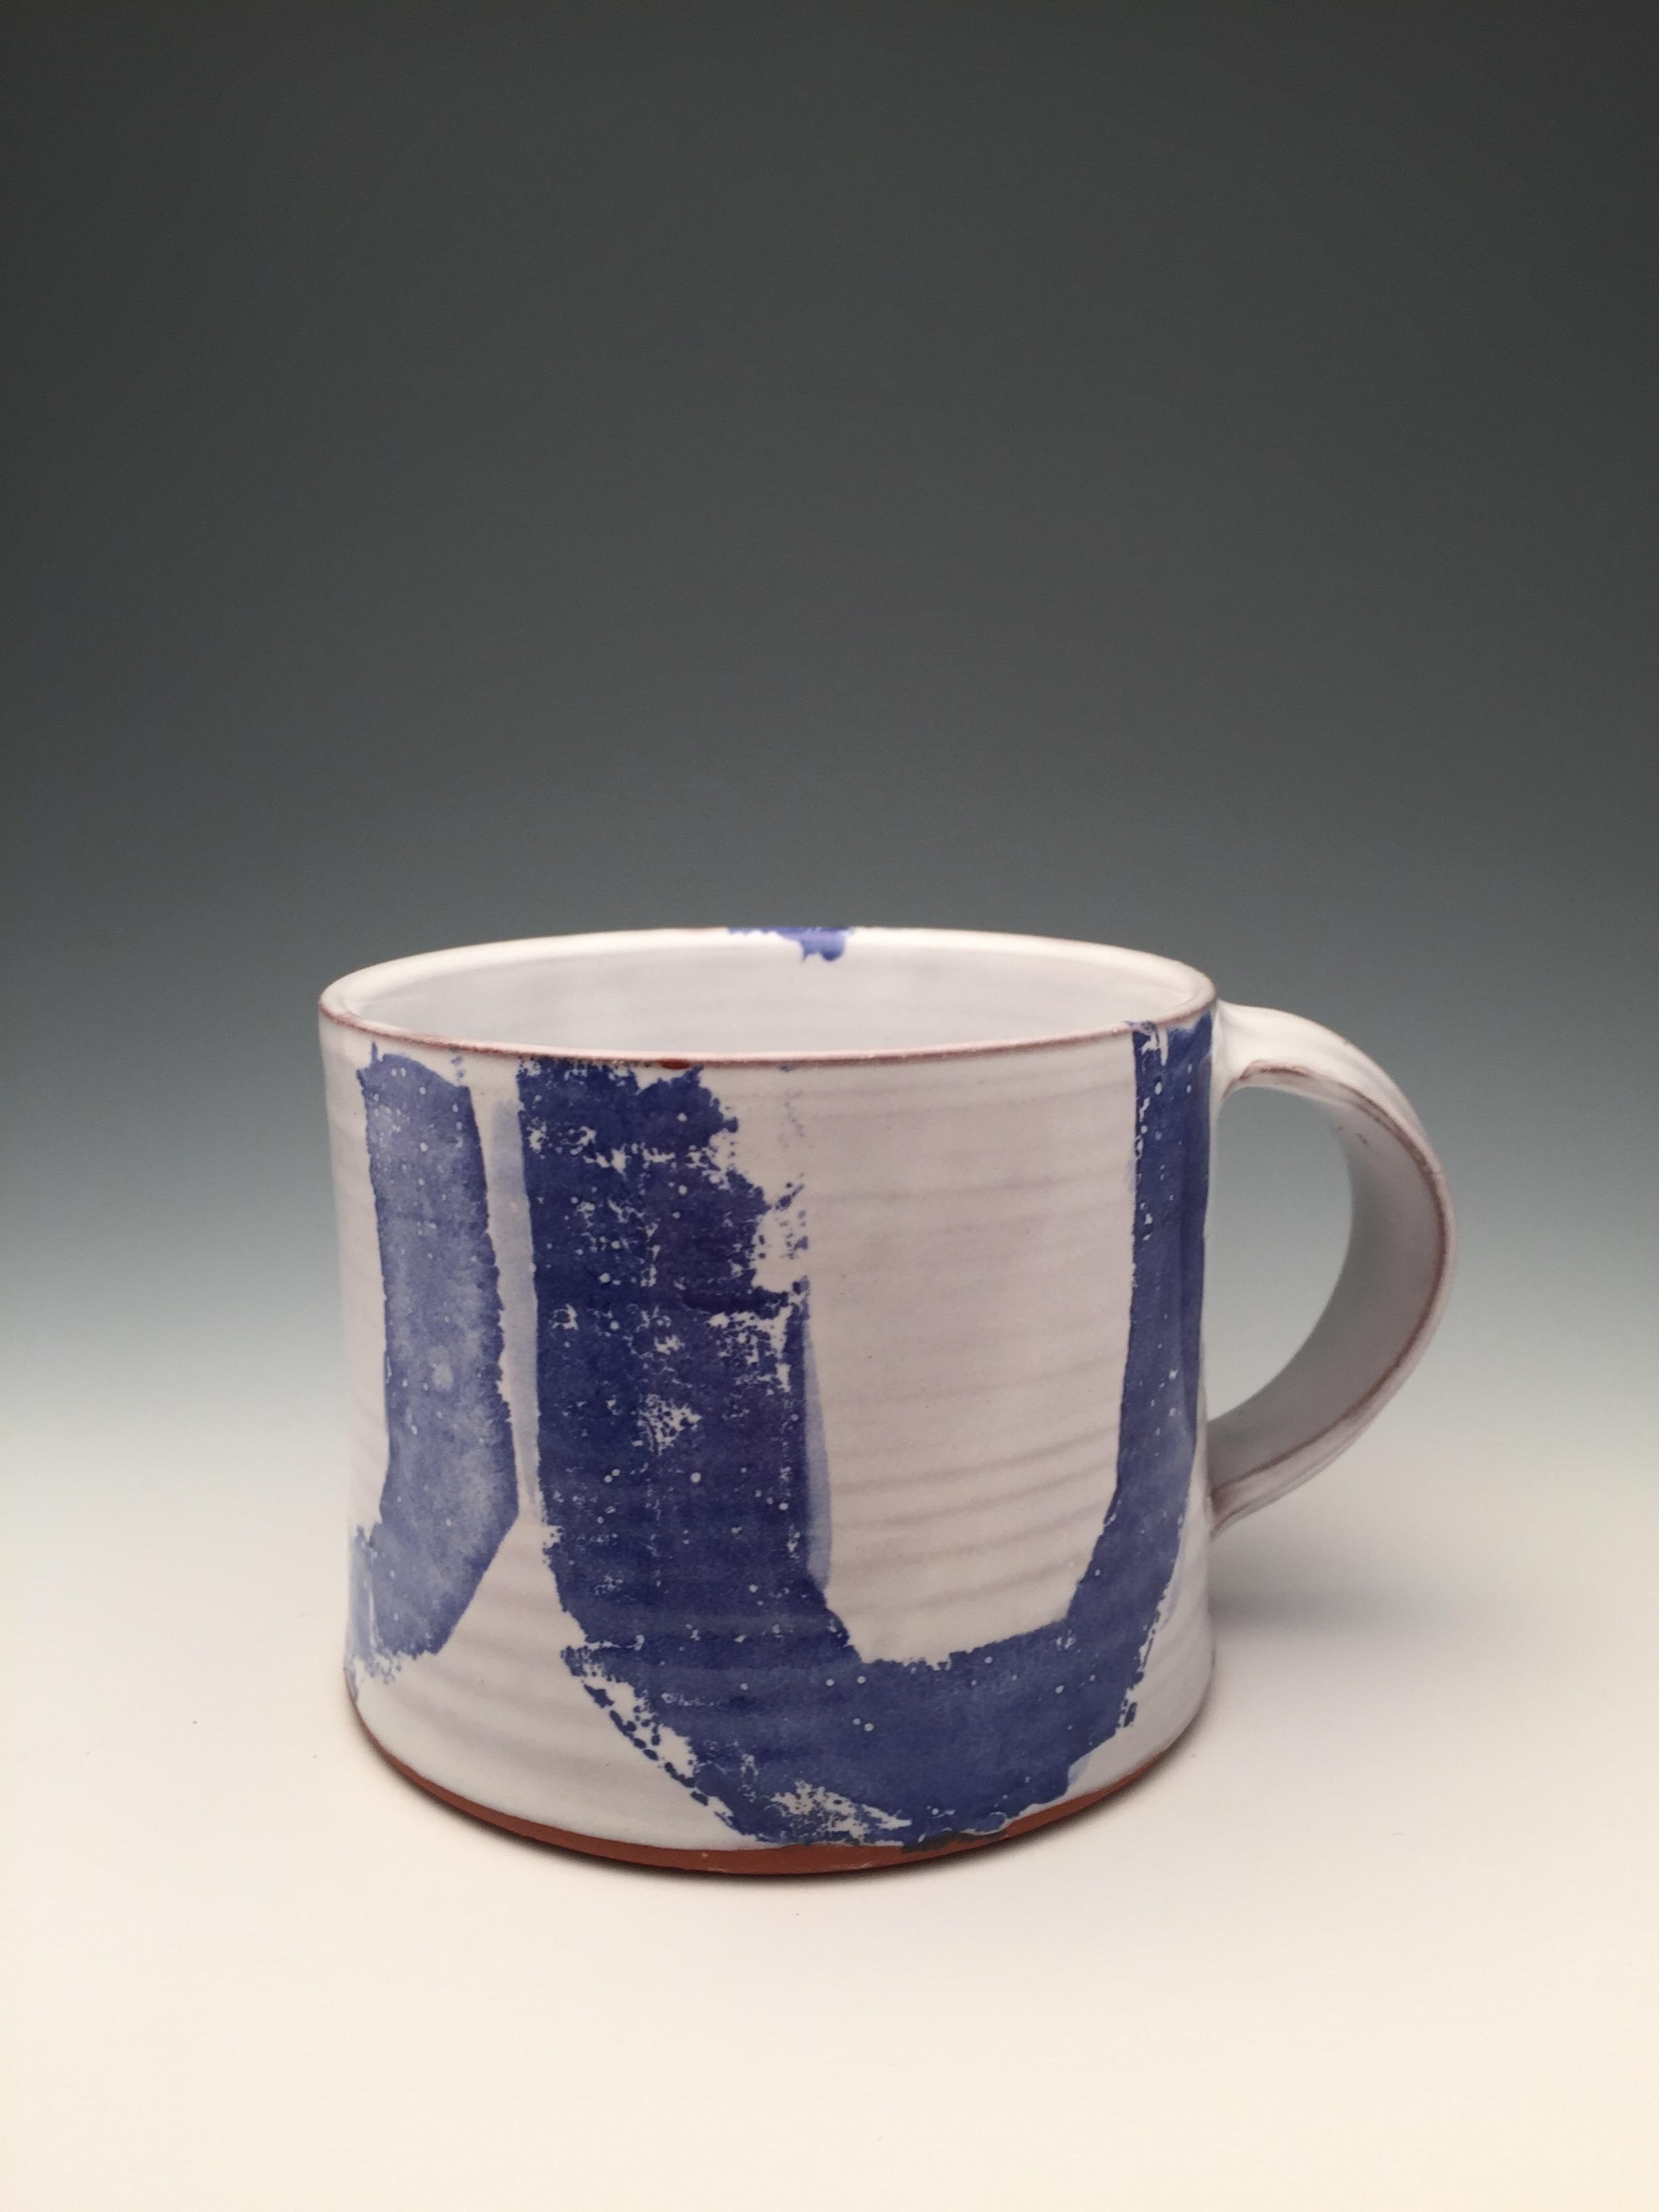 Earthenware mug with majolica glaze. 2016.